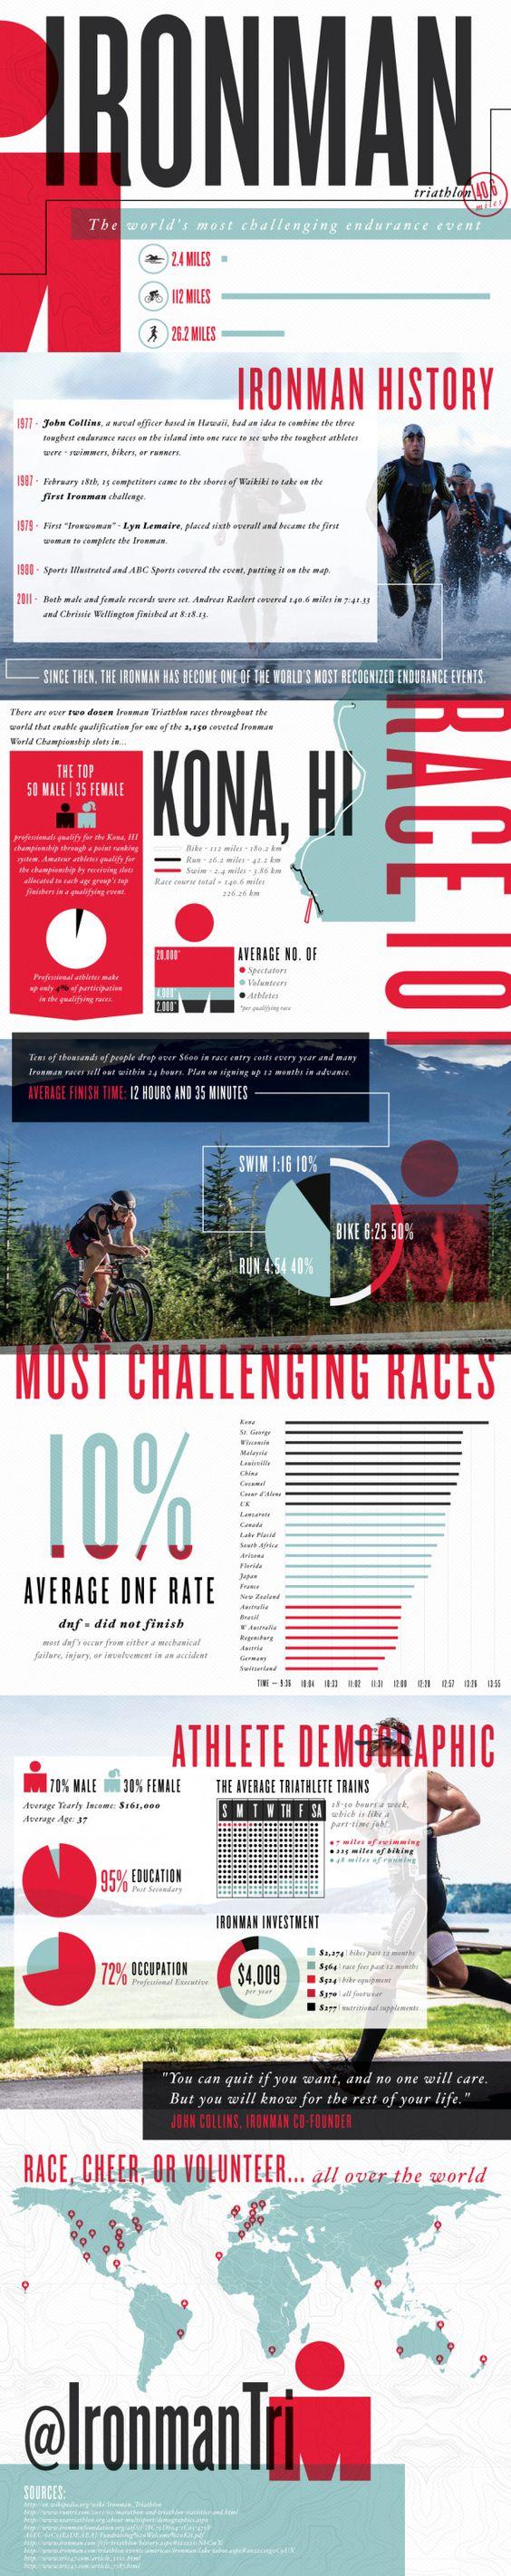 Ironman Triathlon Infographic | Lemonly